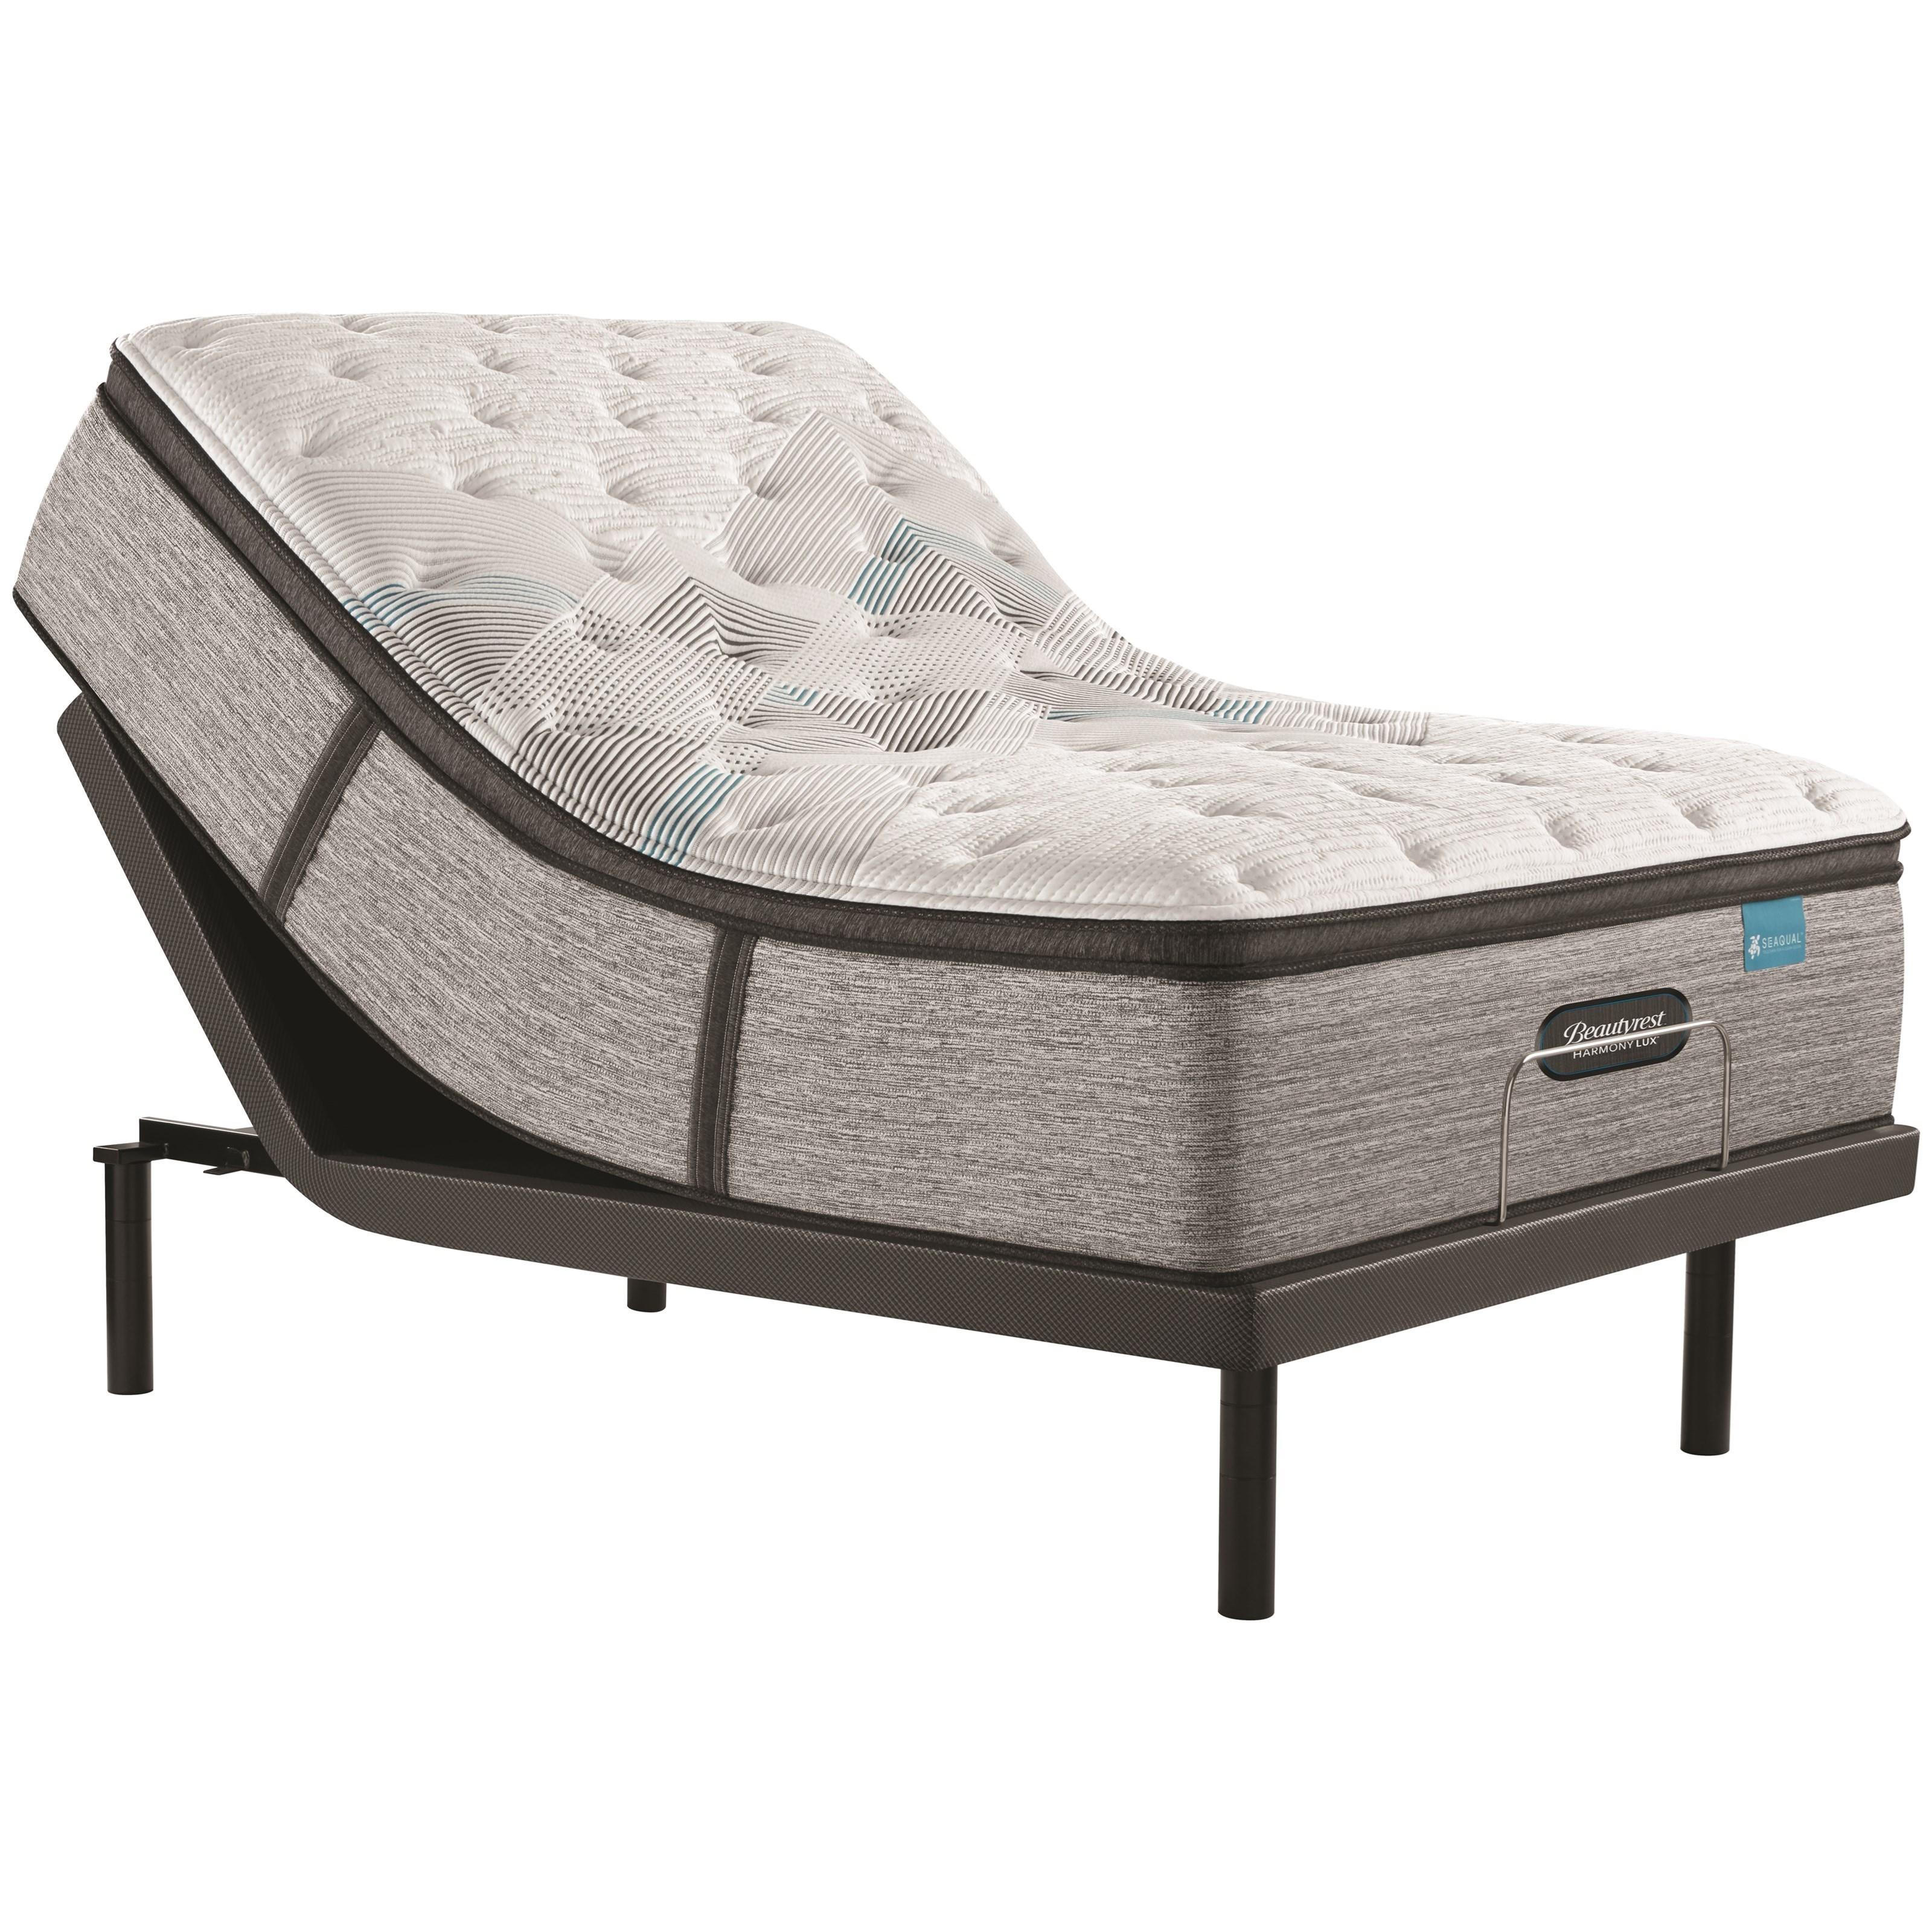 "Carbon Series Medium PT Twin XL 15 3/4"" Medium PT Adj Set by Beautyrest at Furniture and ApplianceMart"